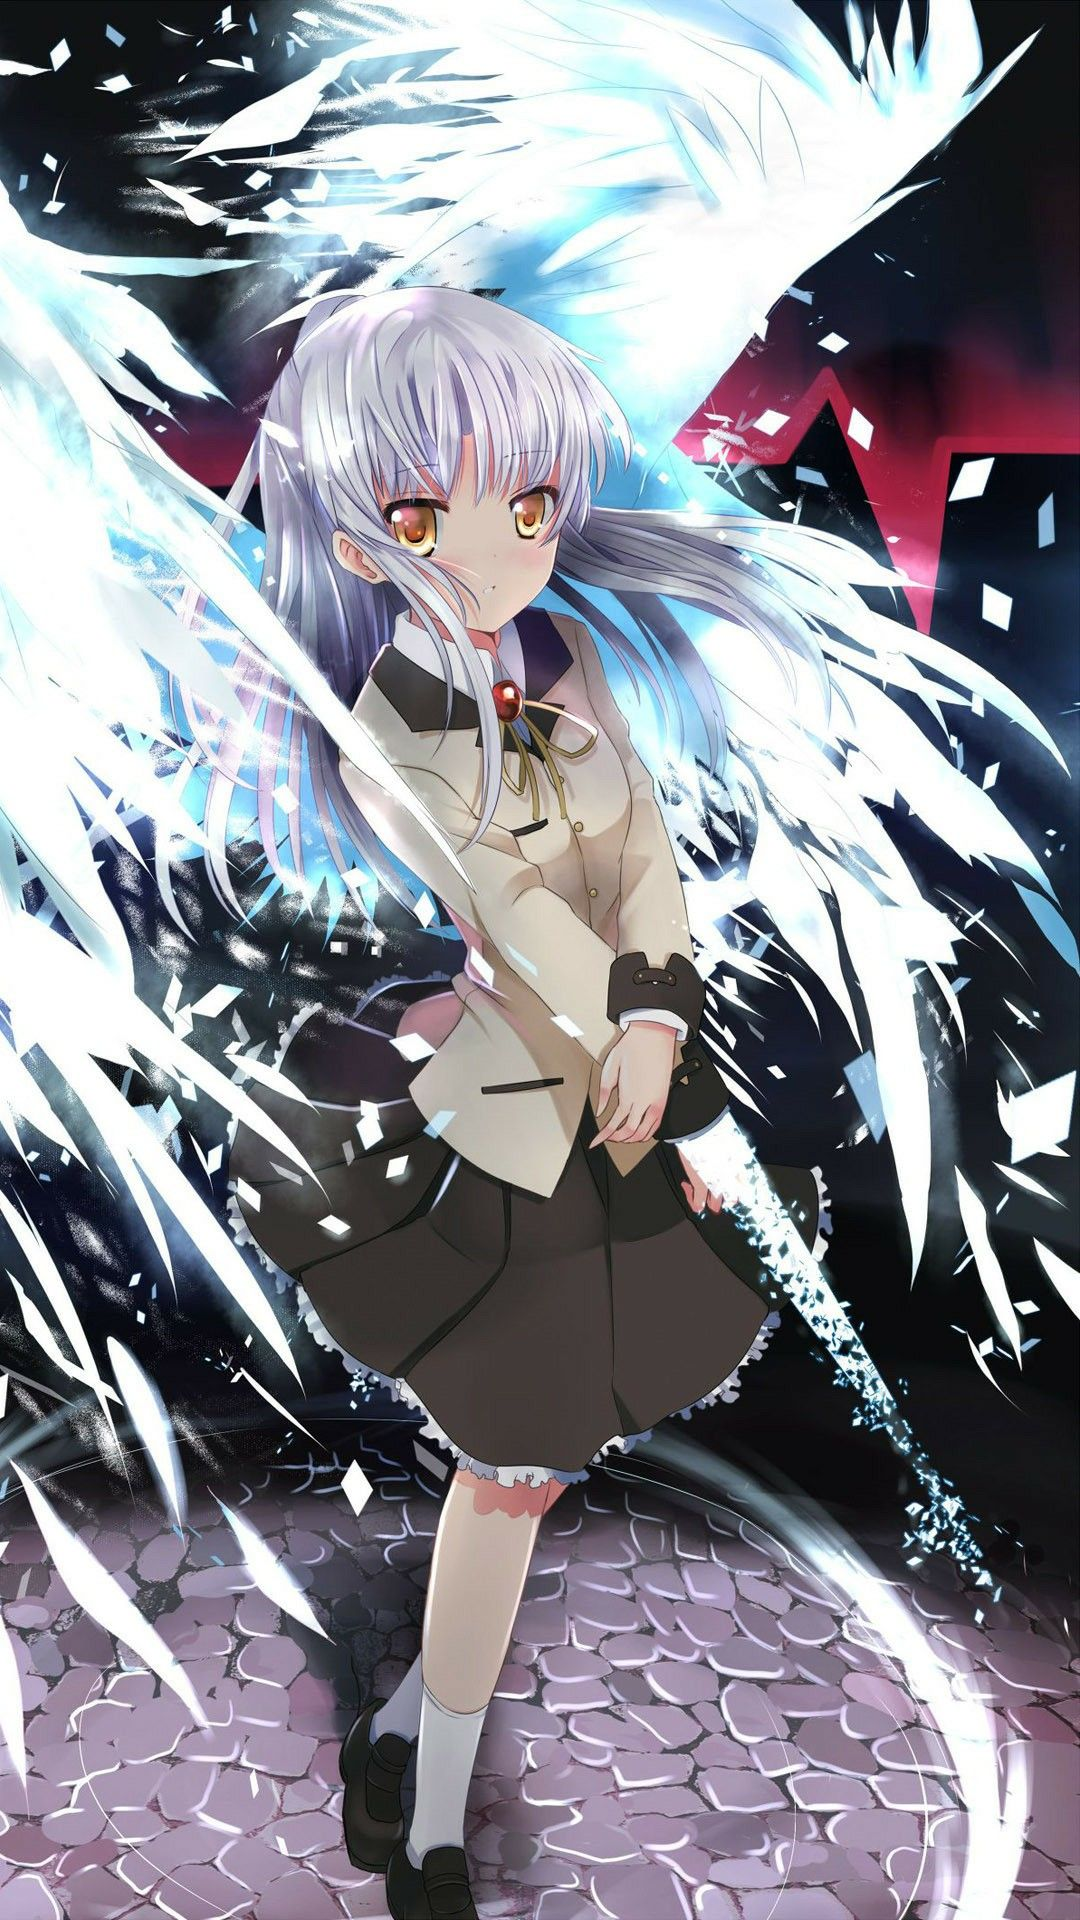 Kanade Tachibana Angel Beats Девушки из аниме, Аниме